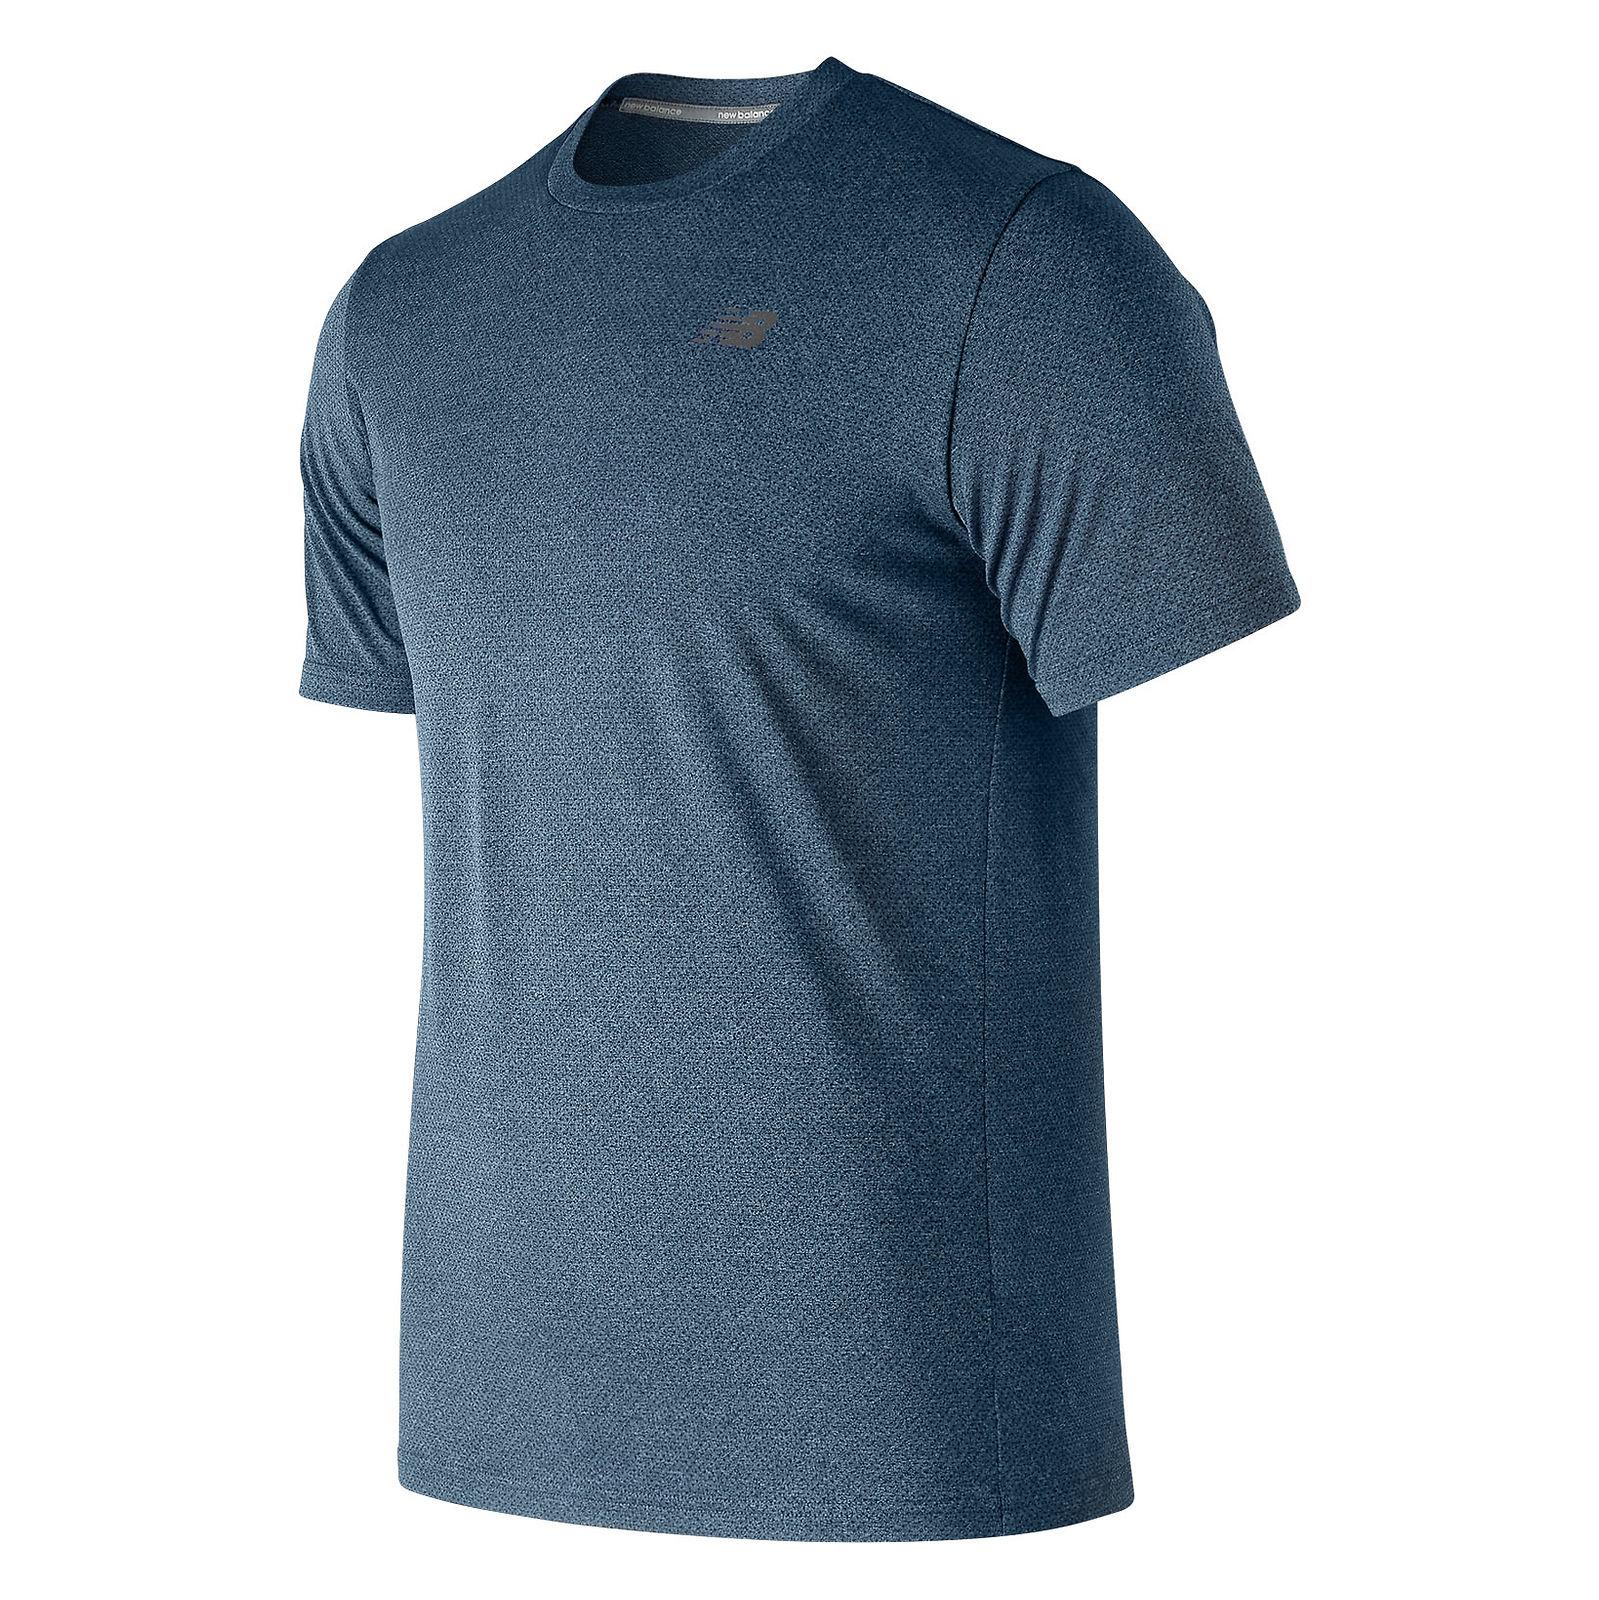 Koszulka męska do biegania New Balance MT91920